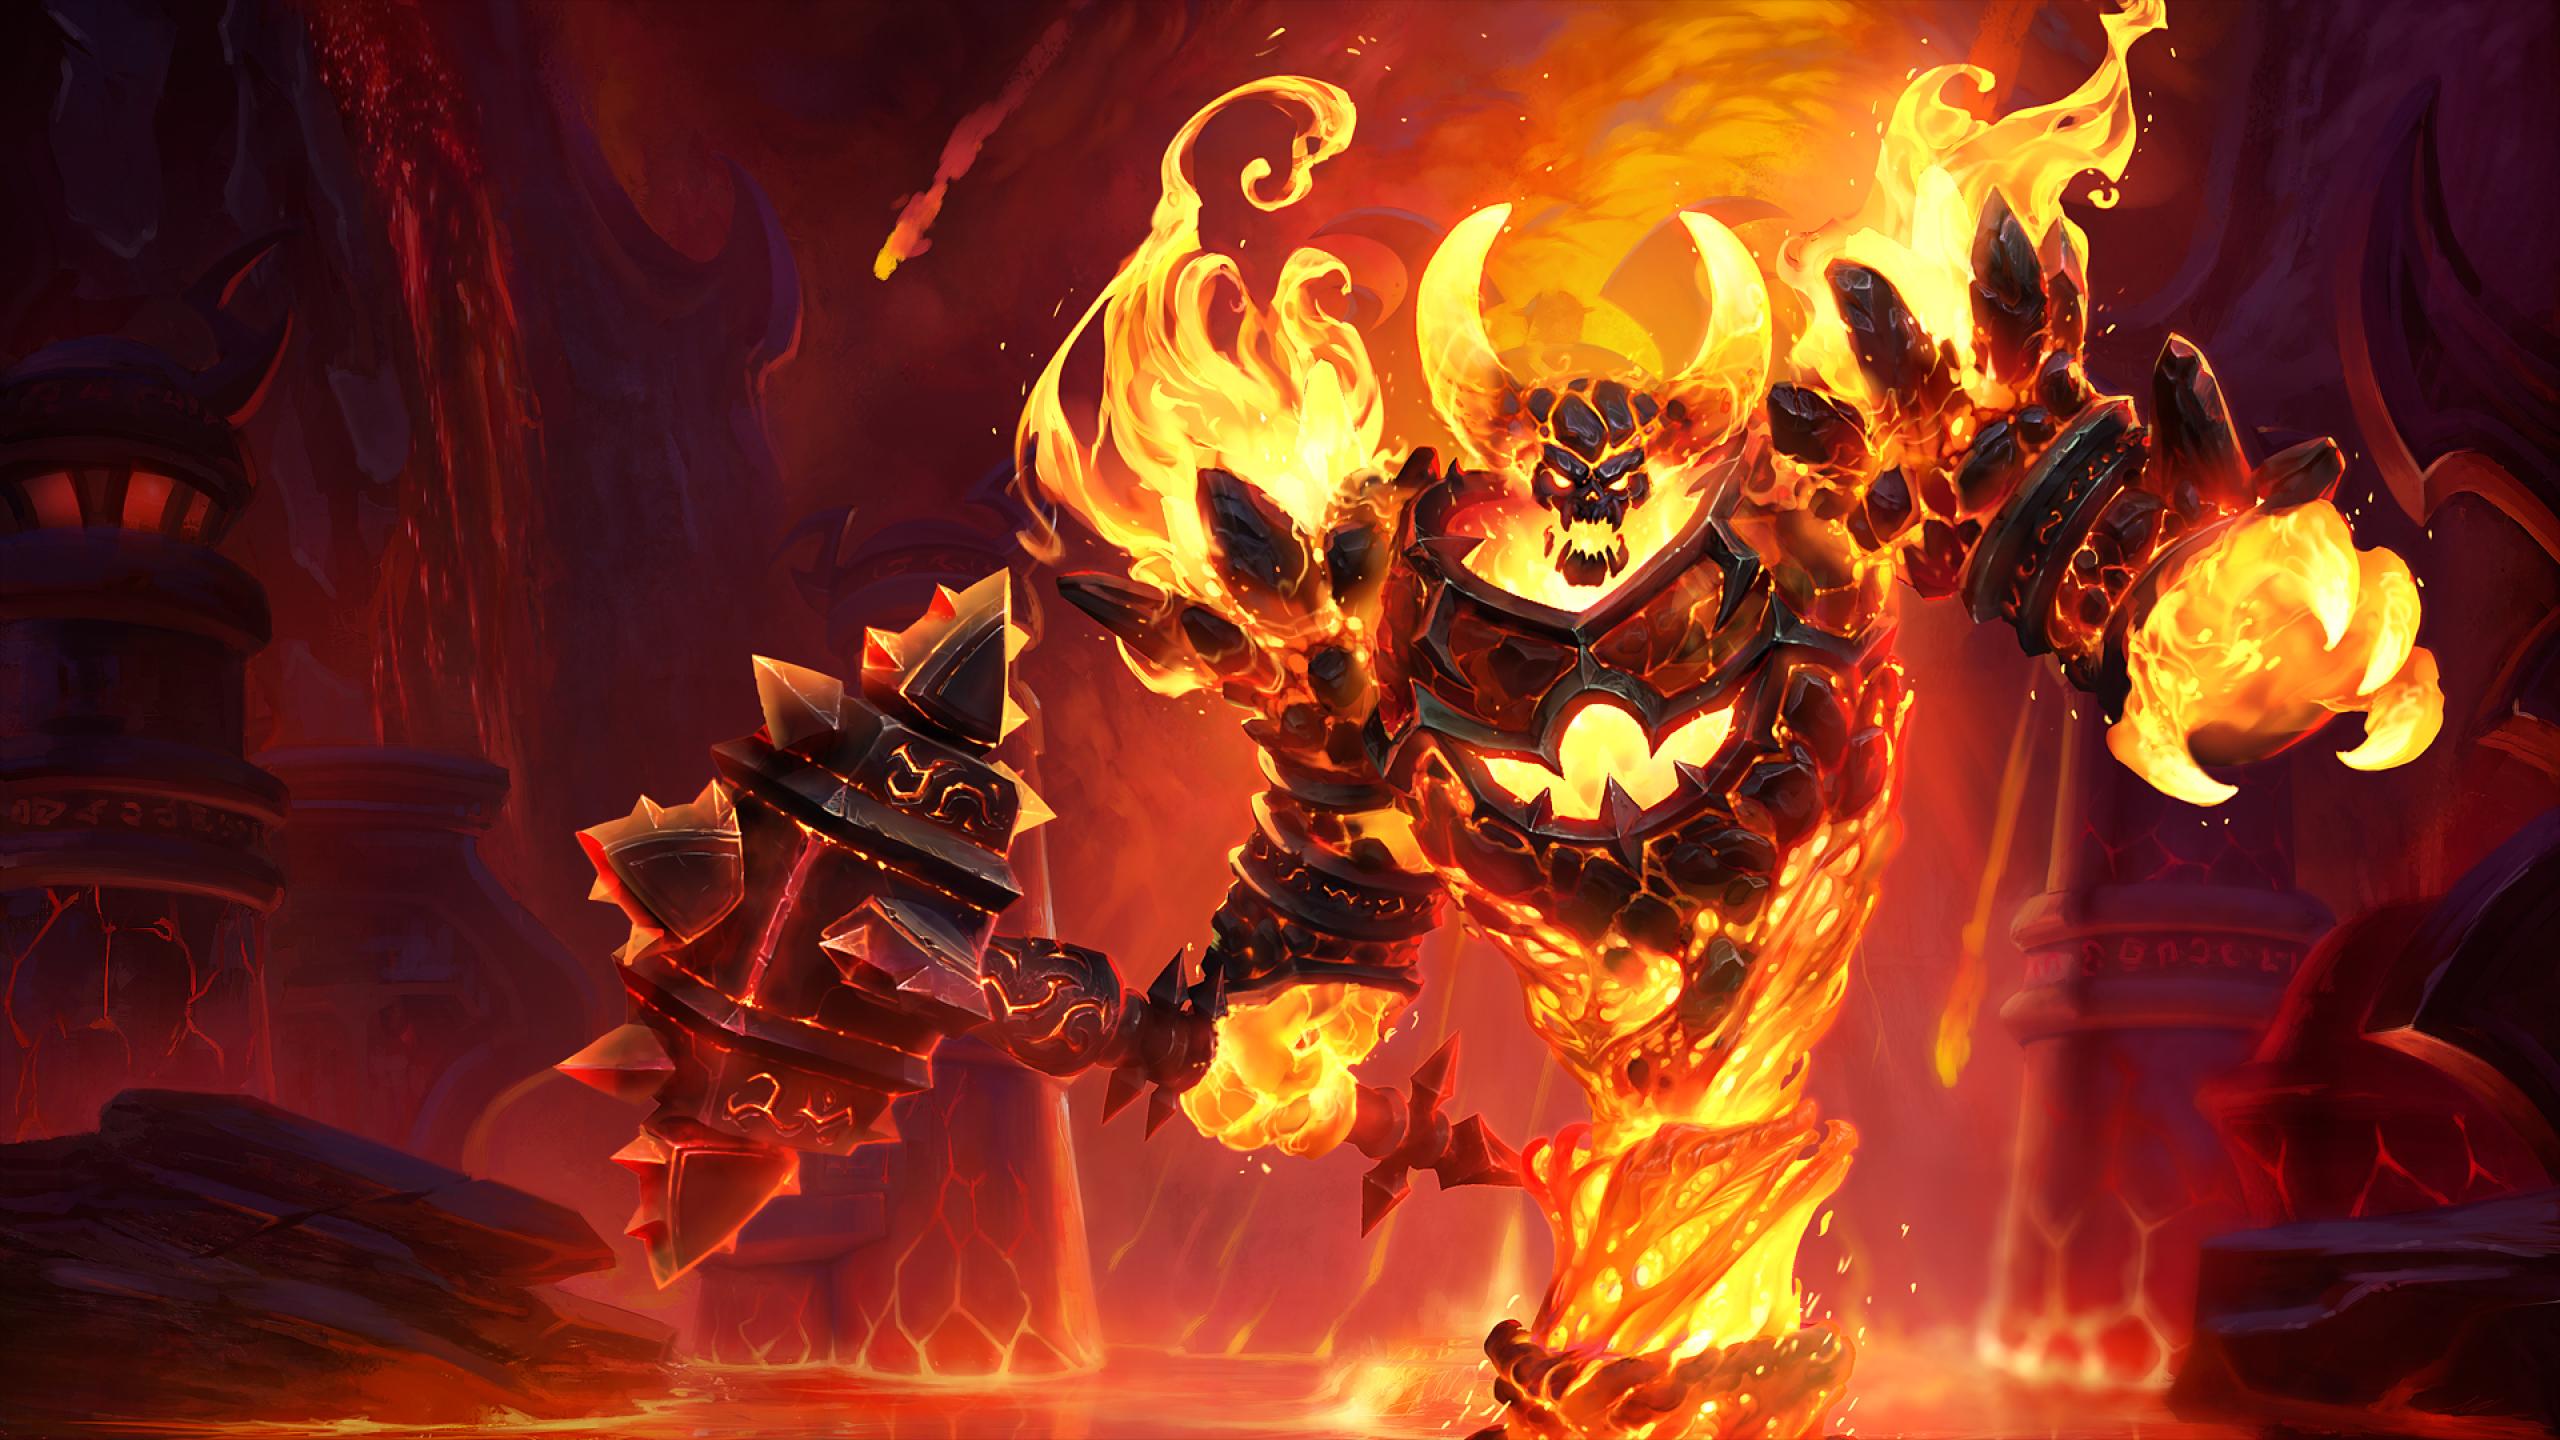 2560x1440 World of Warcraft Ragnaros Fire Art 1440P